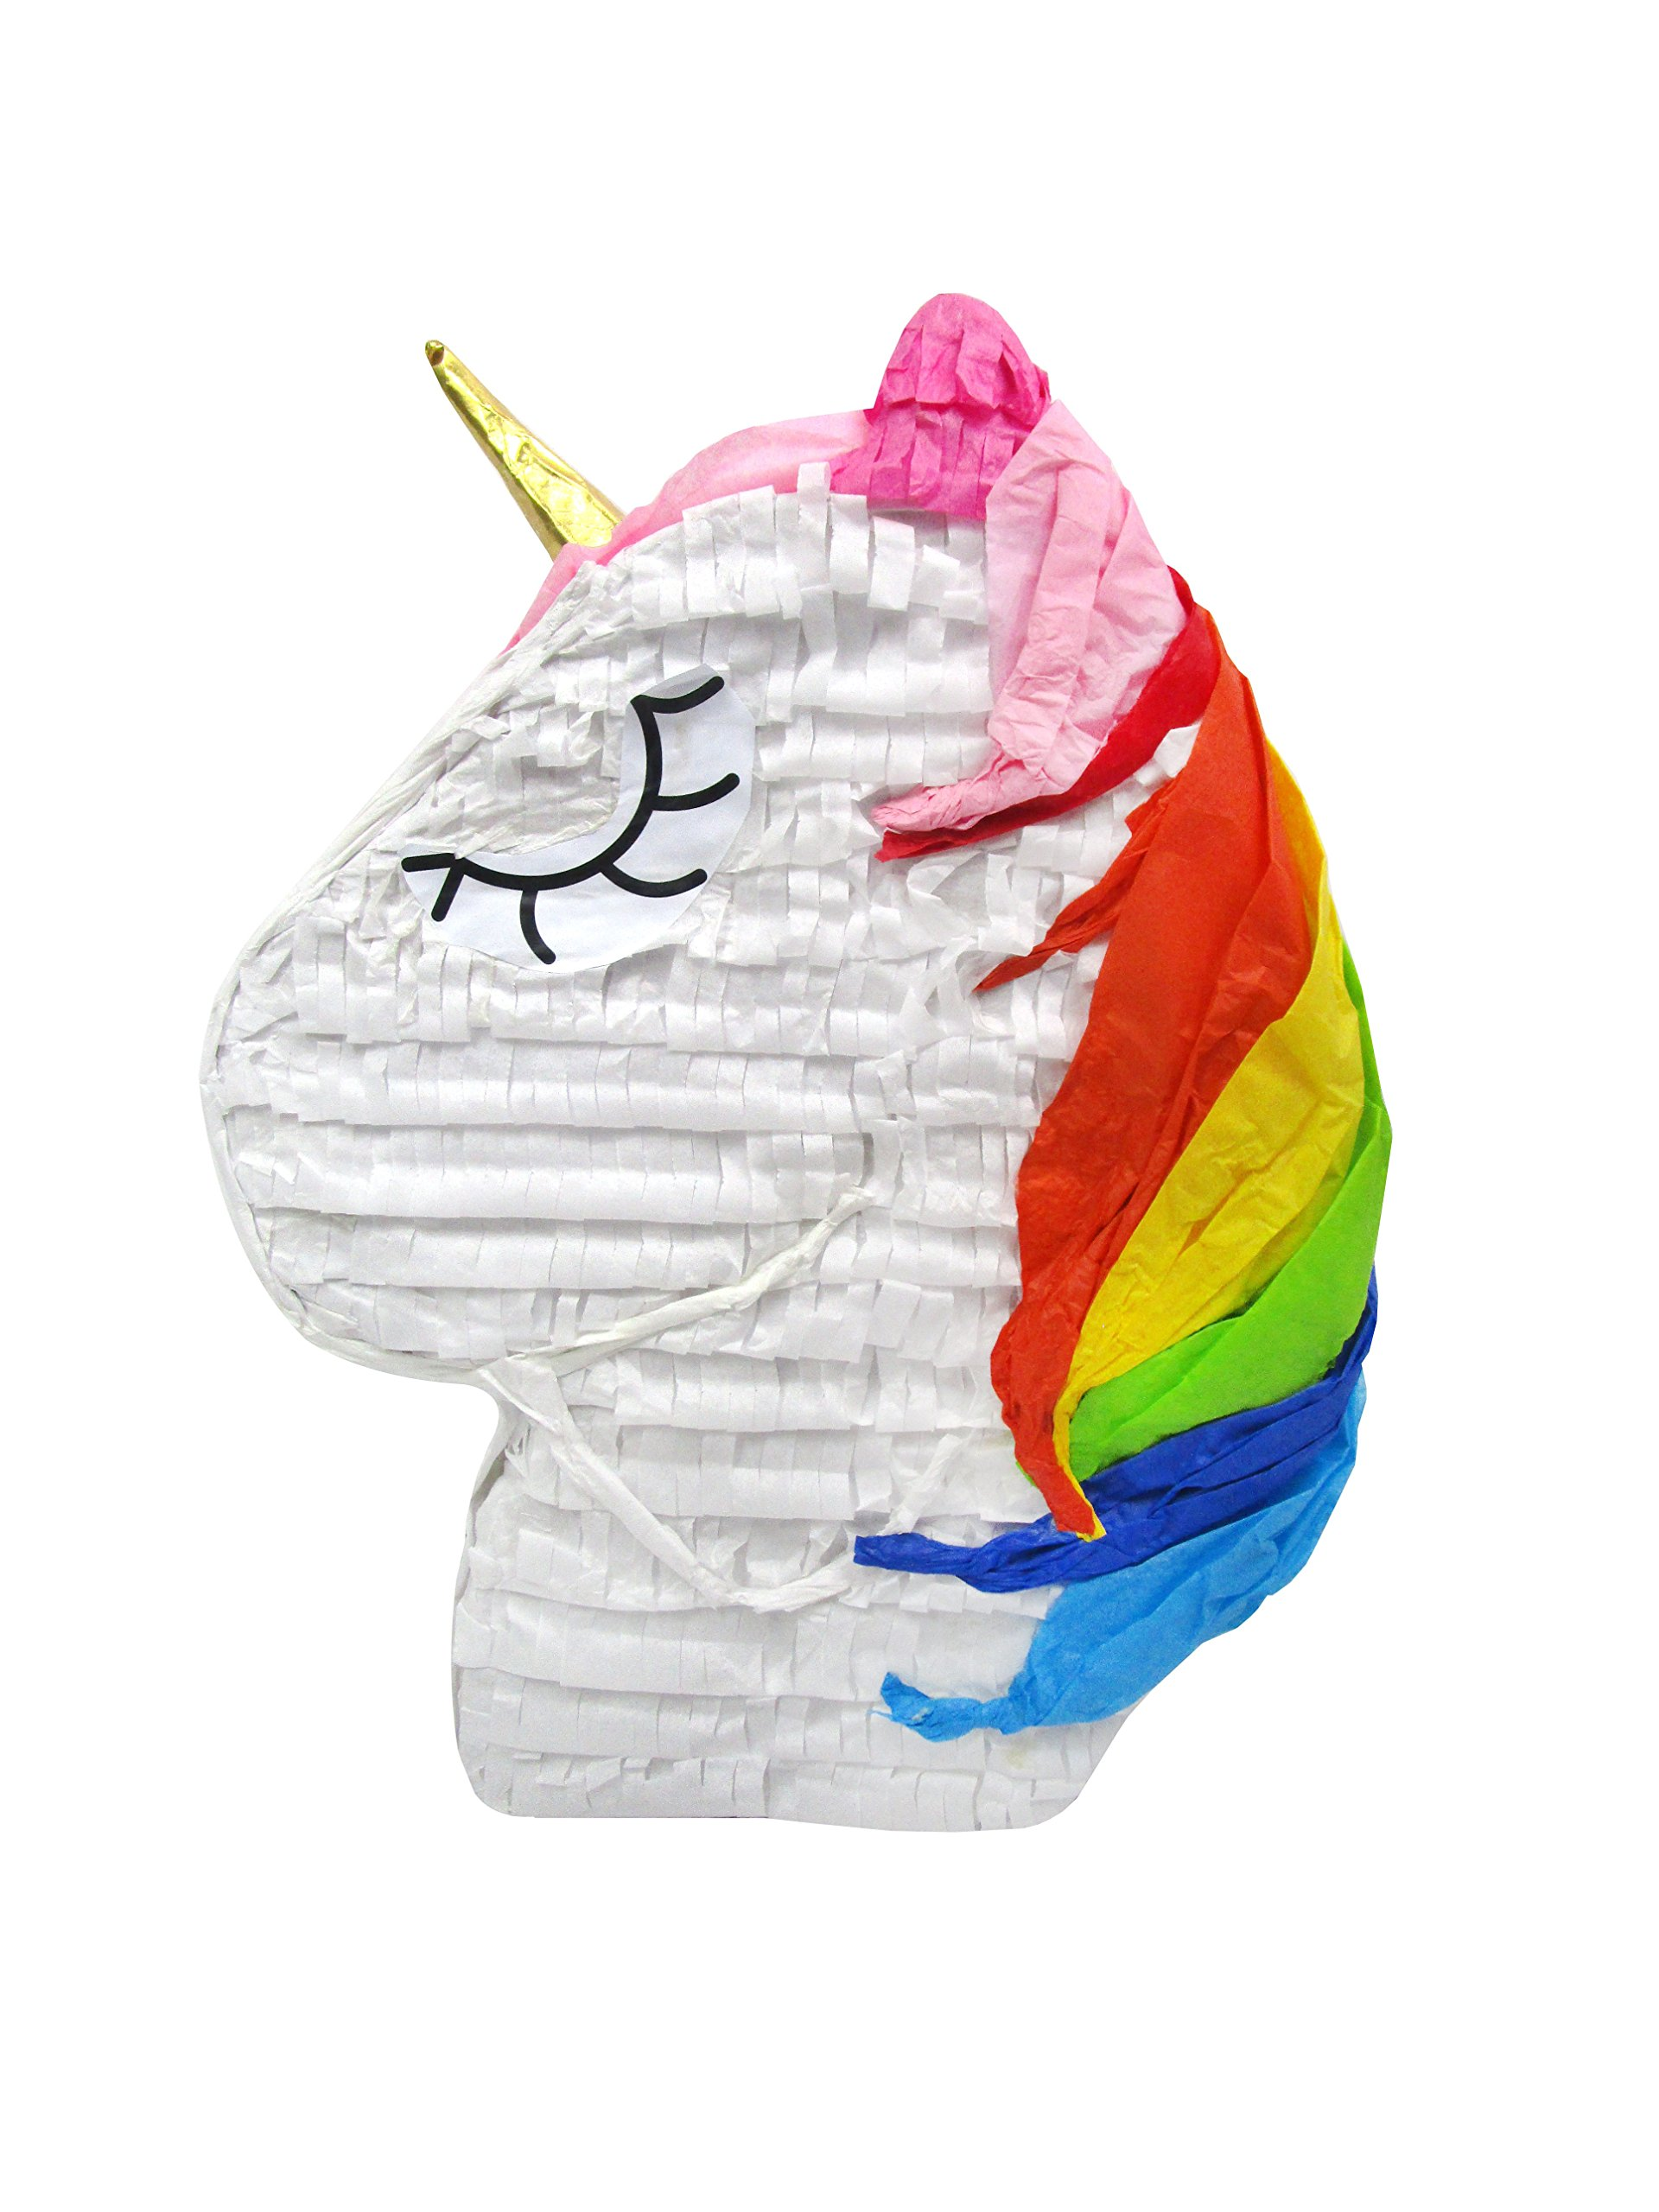 Sleepy Rainbow Unicorn Pinata - Party Game, Photo Prop, Birthday Centerpiece and Room Decoration by Pinatas